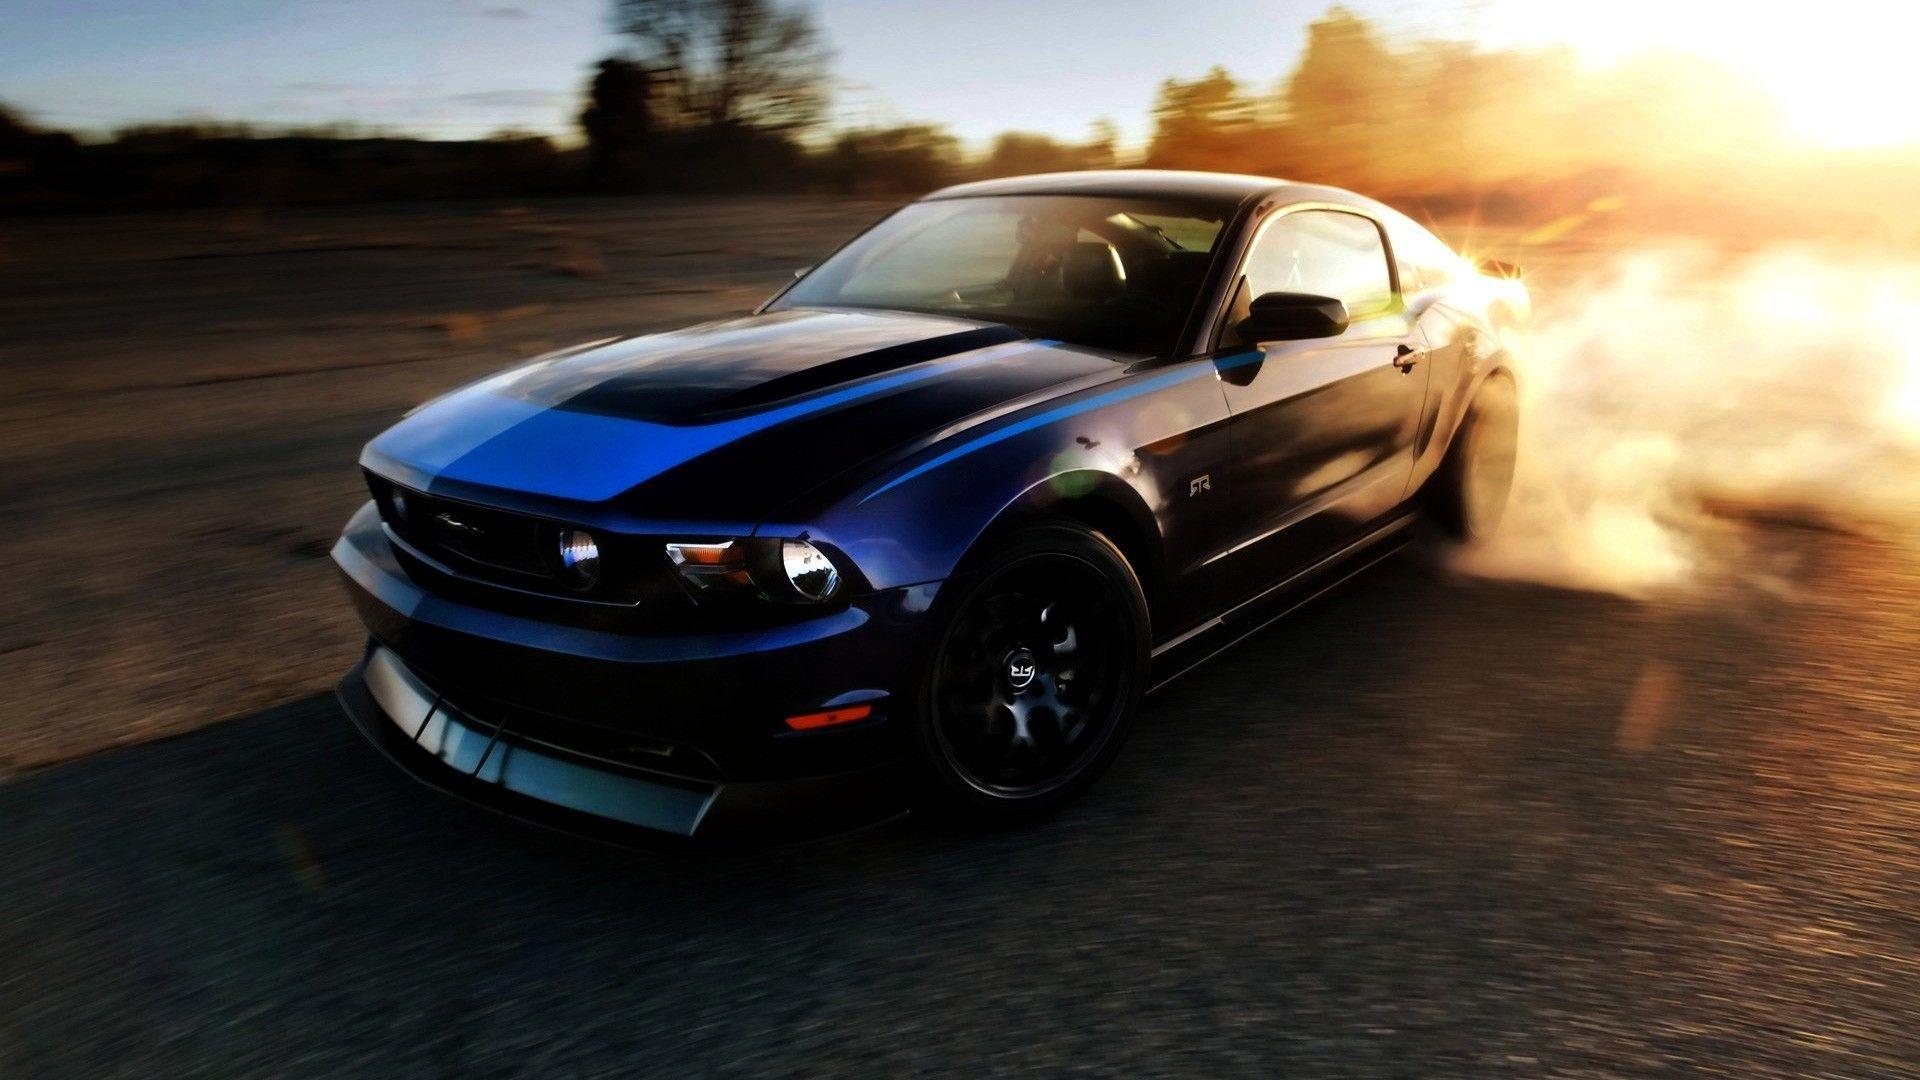 Mustang Mustang Drift Ford Mustang Ford Mustang Wallpaper